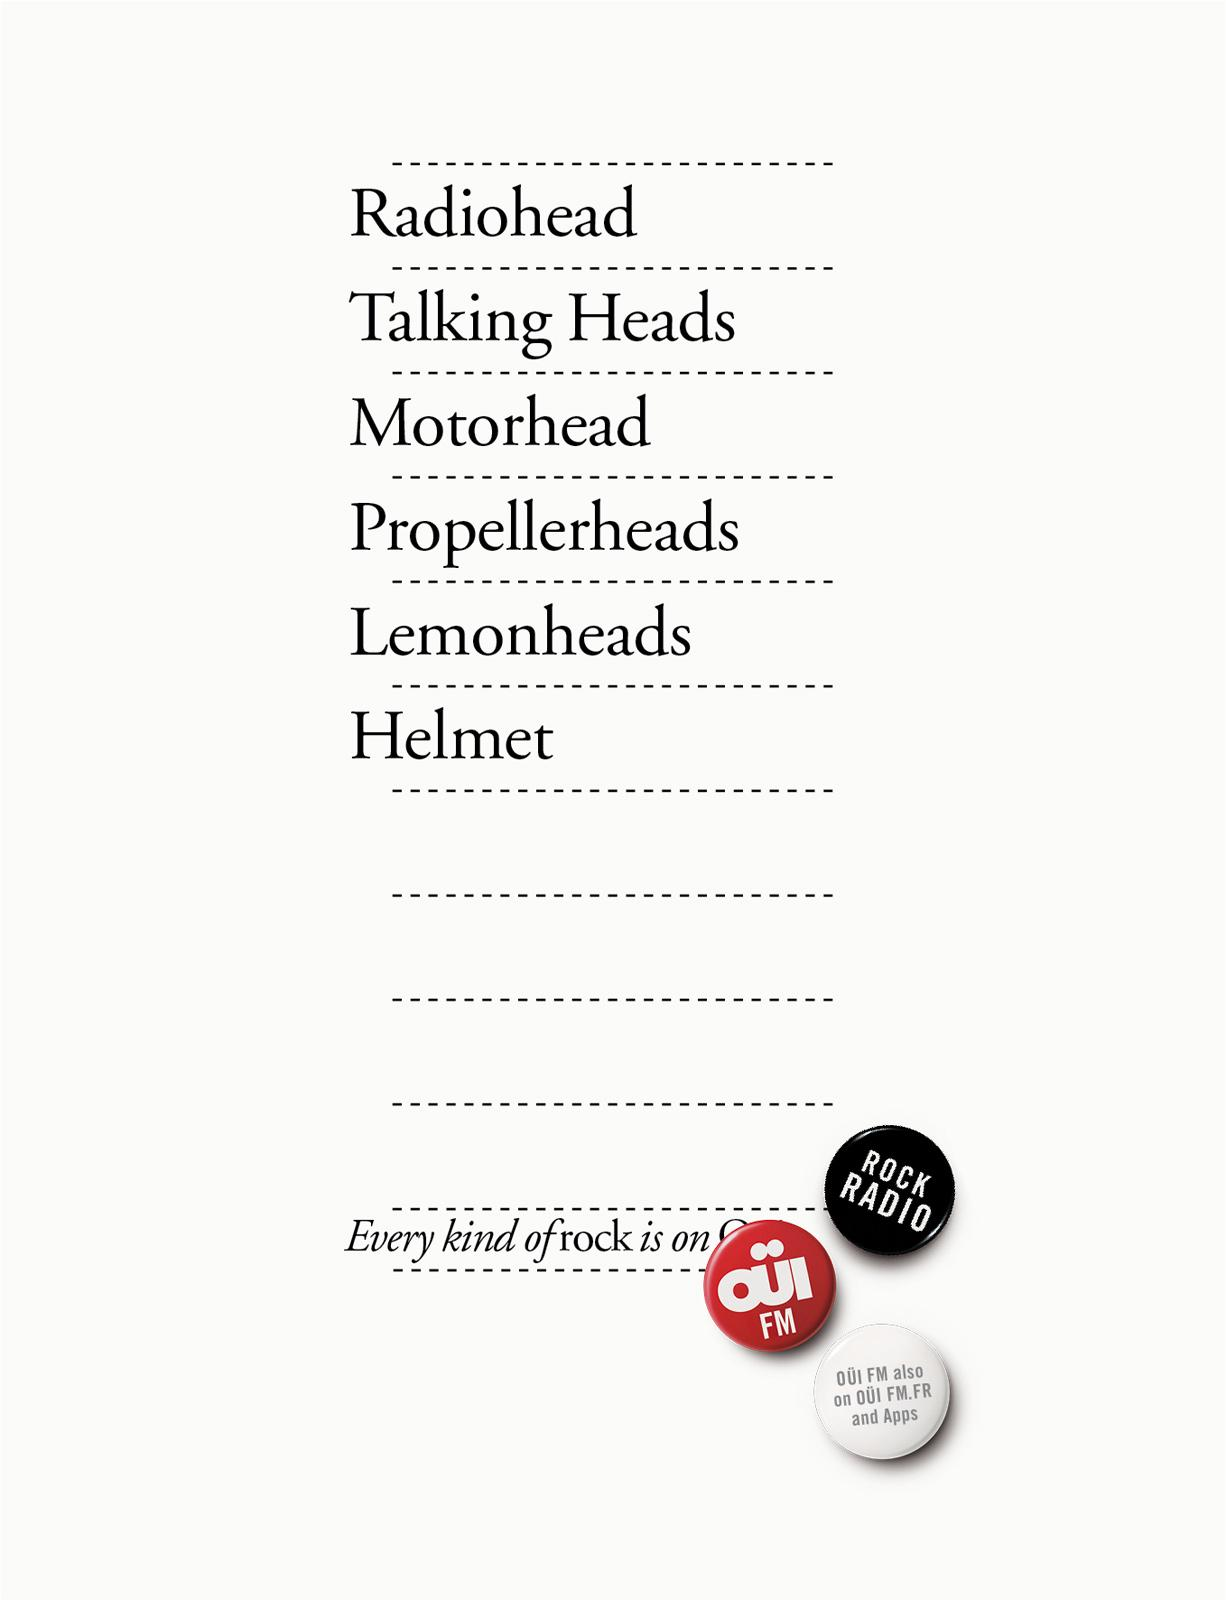 Oui FM Print Ad -  Every kind of rock, 9